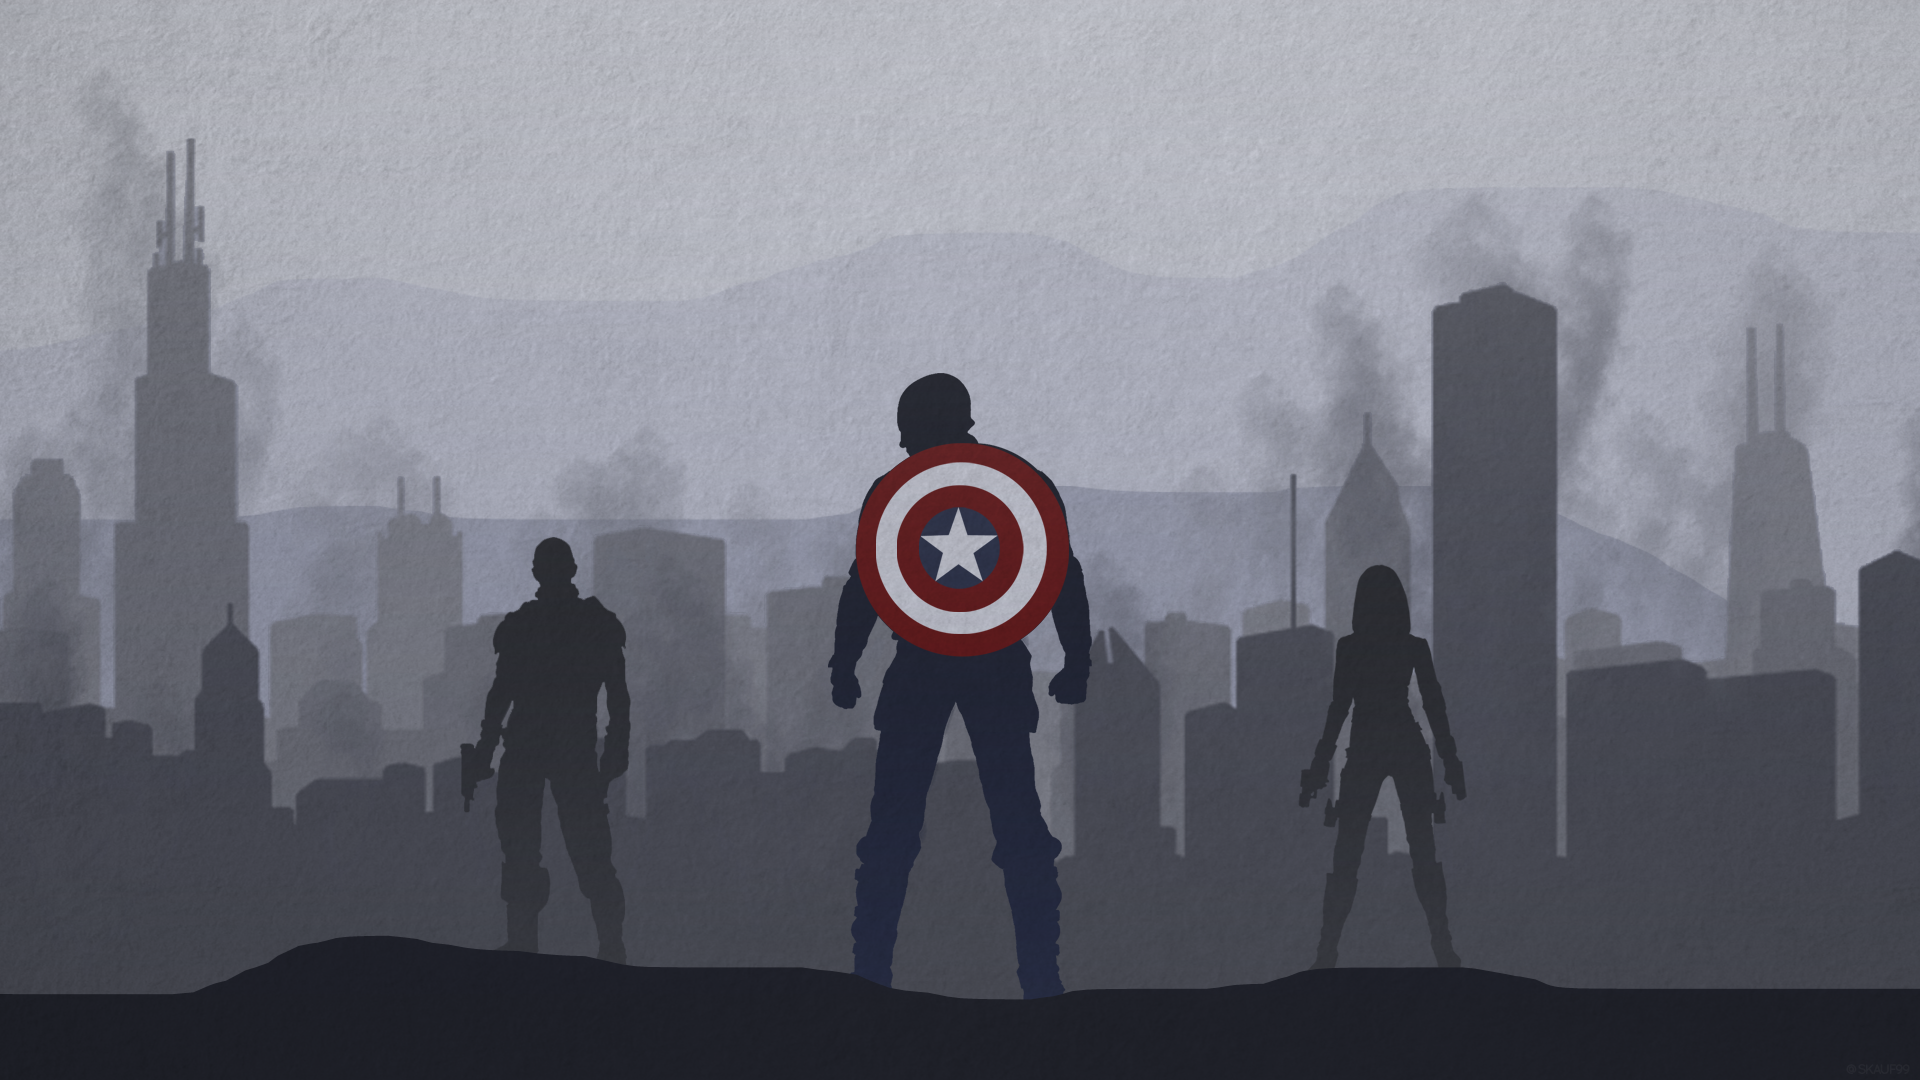 Captain America Winter Soldier Desktop Wallpaper By Skauf99 On